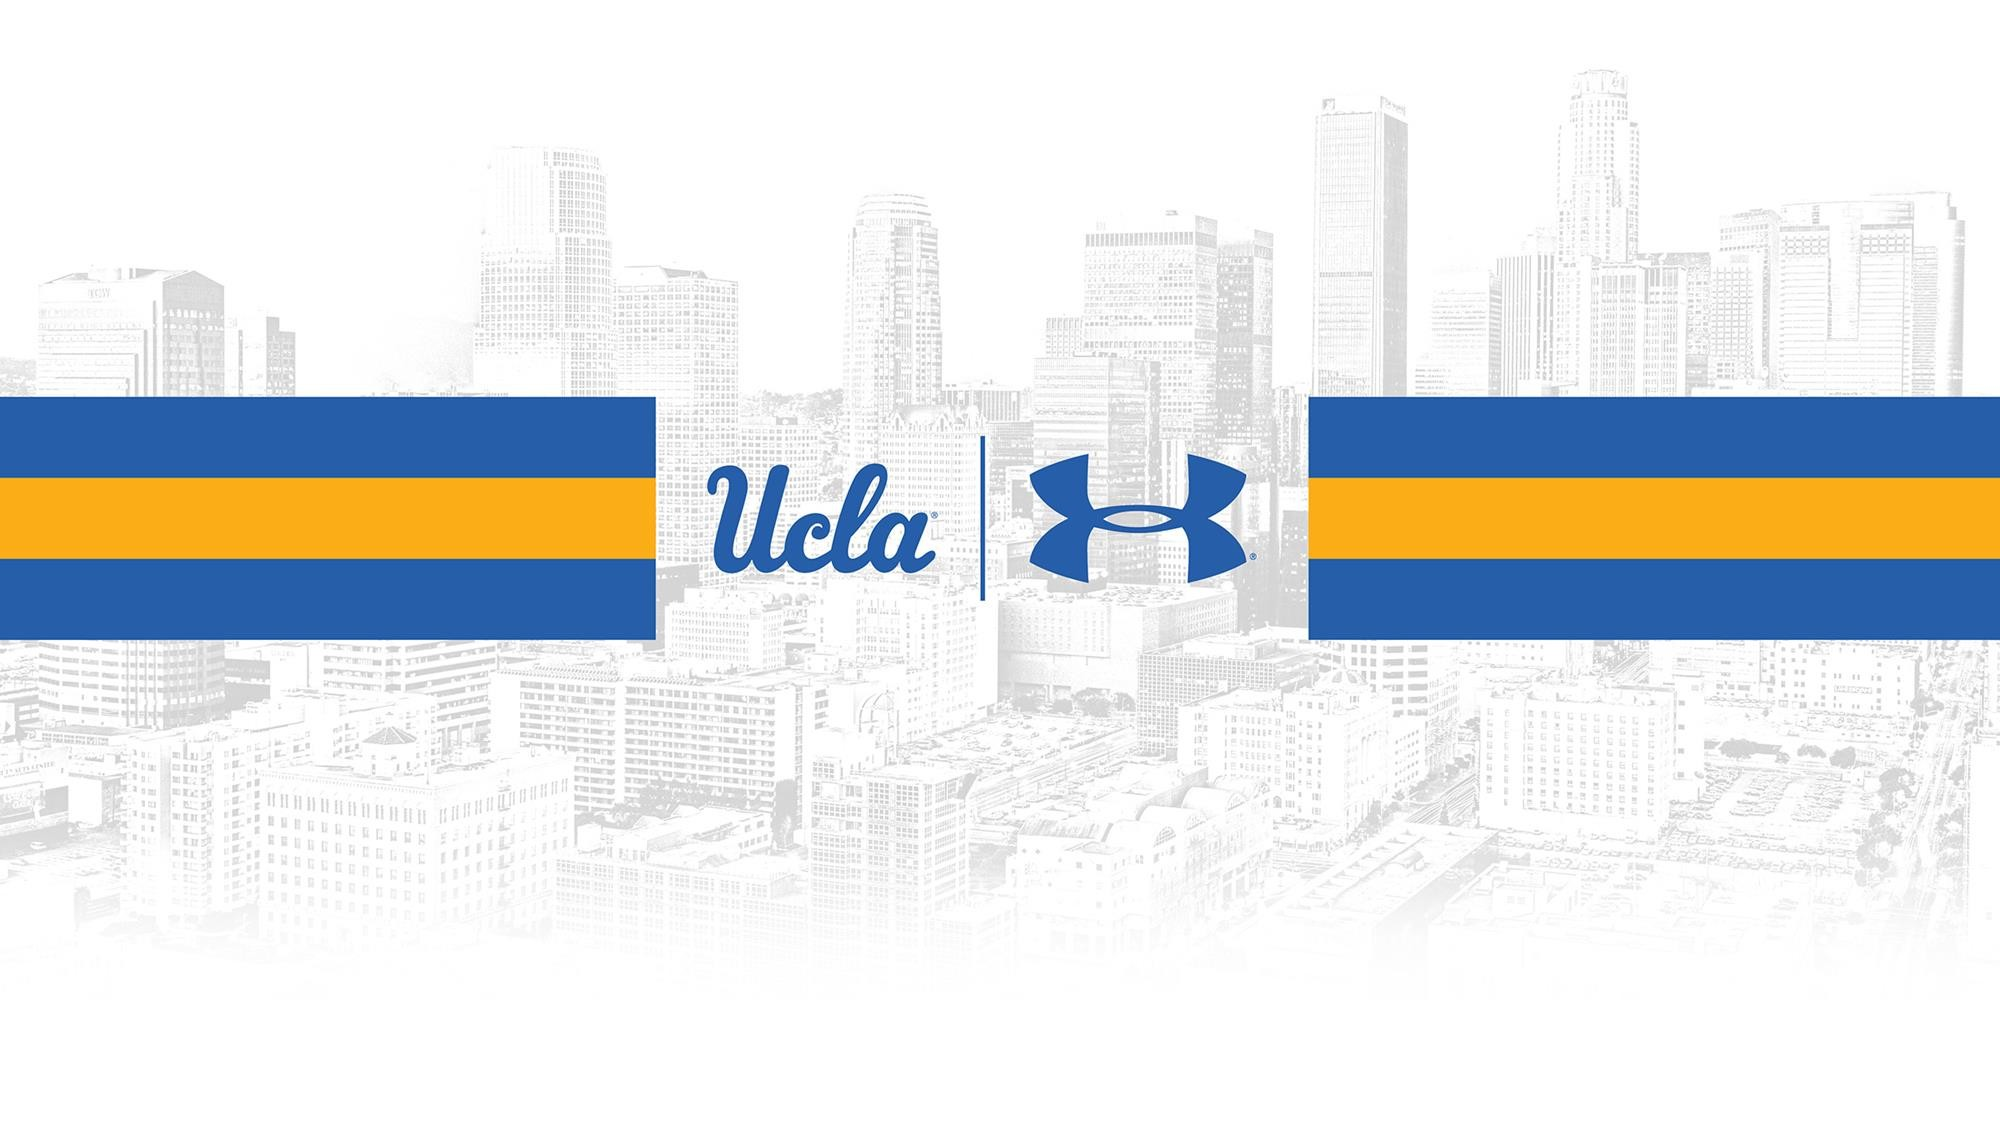 UCLA, Under Armour Kick Off Partnership